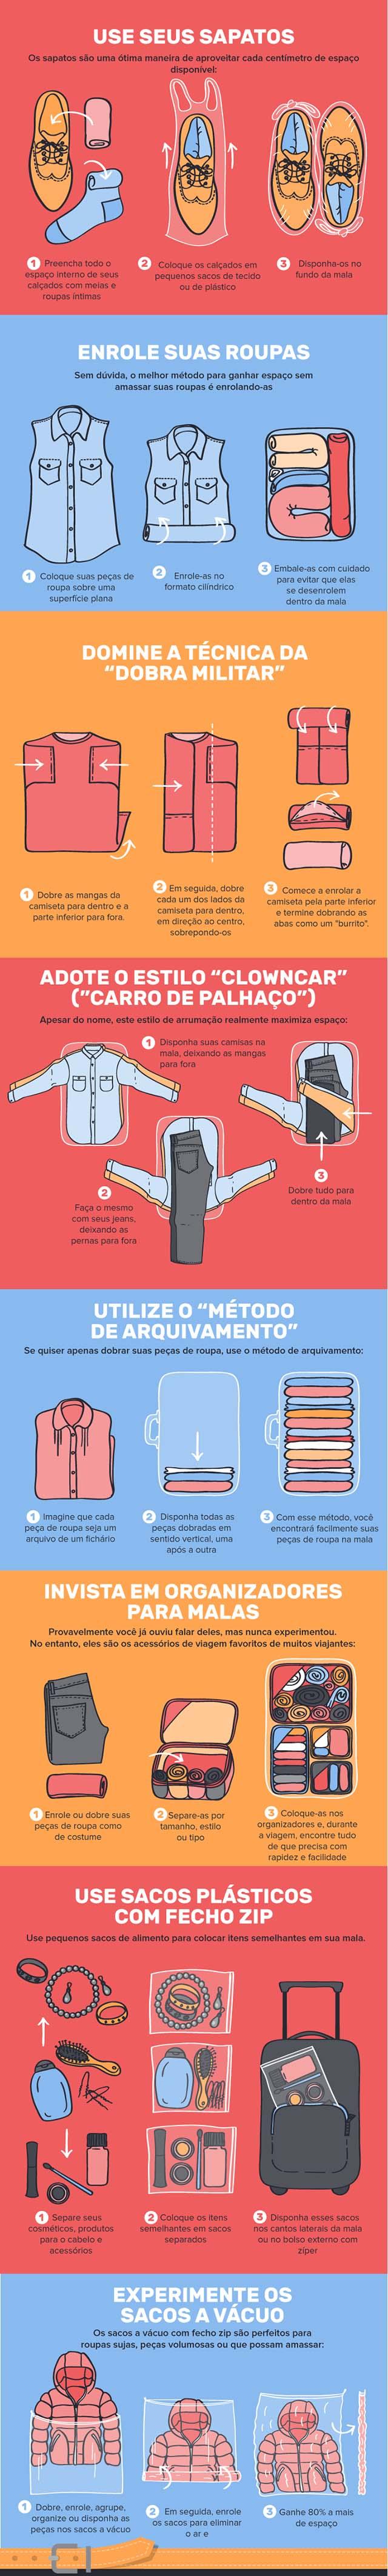 infografico_malas